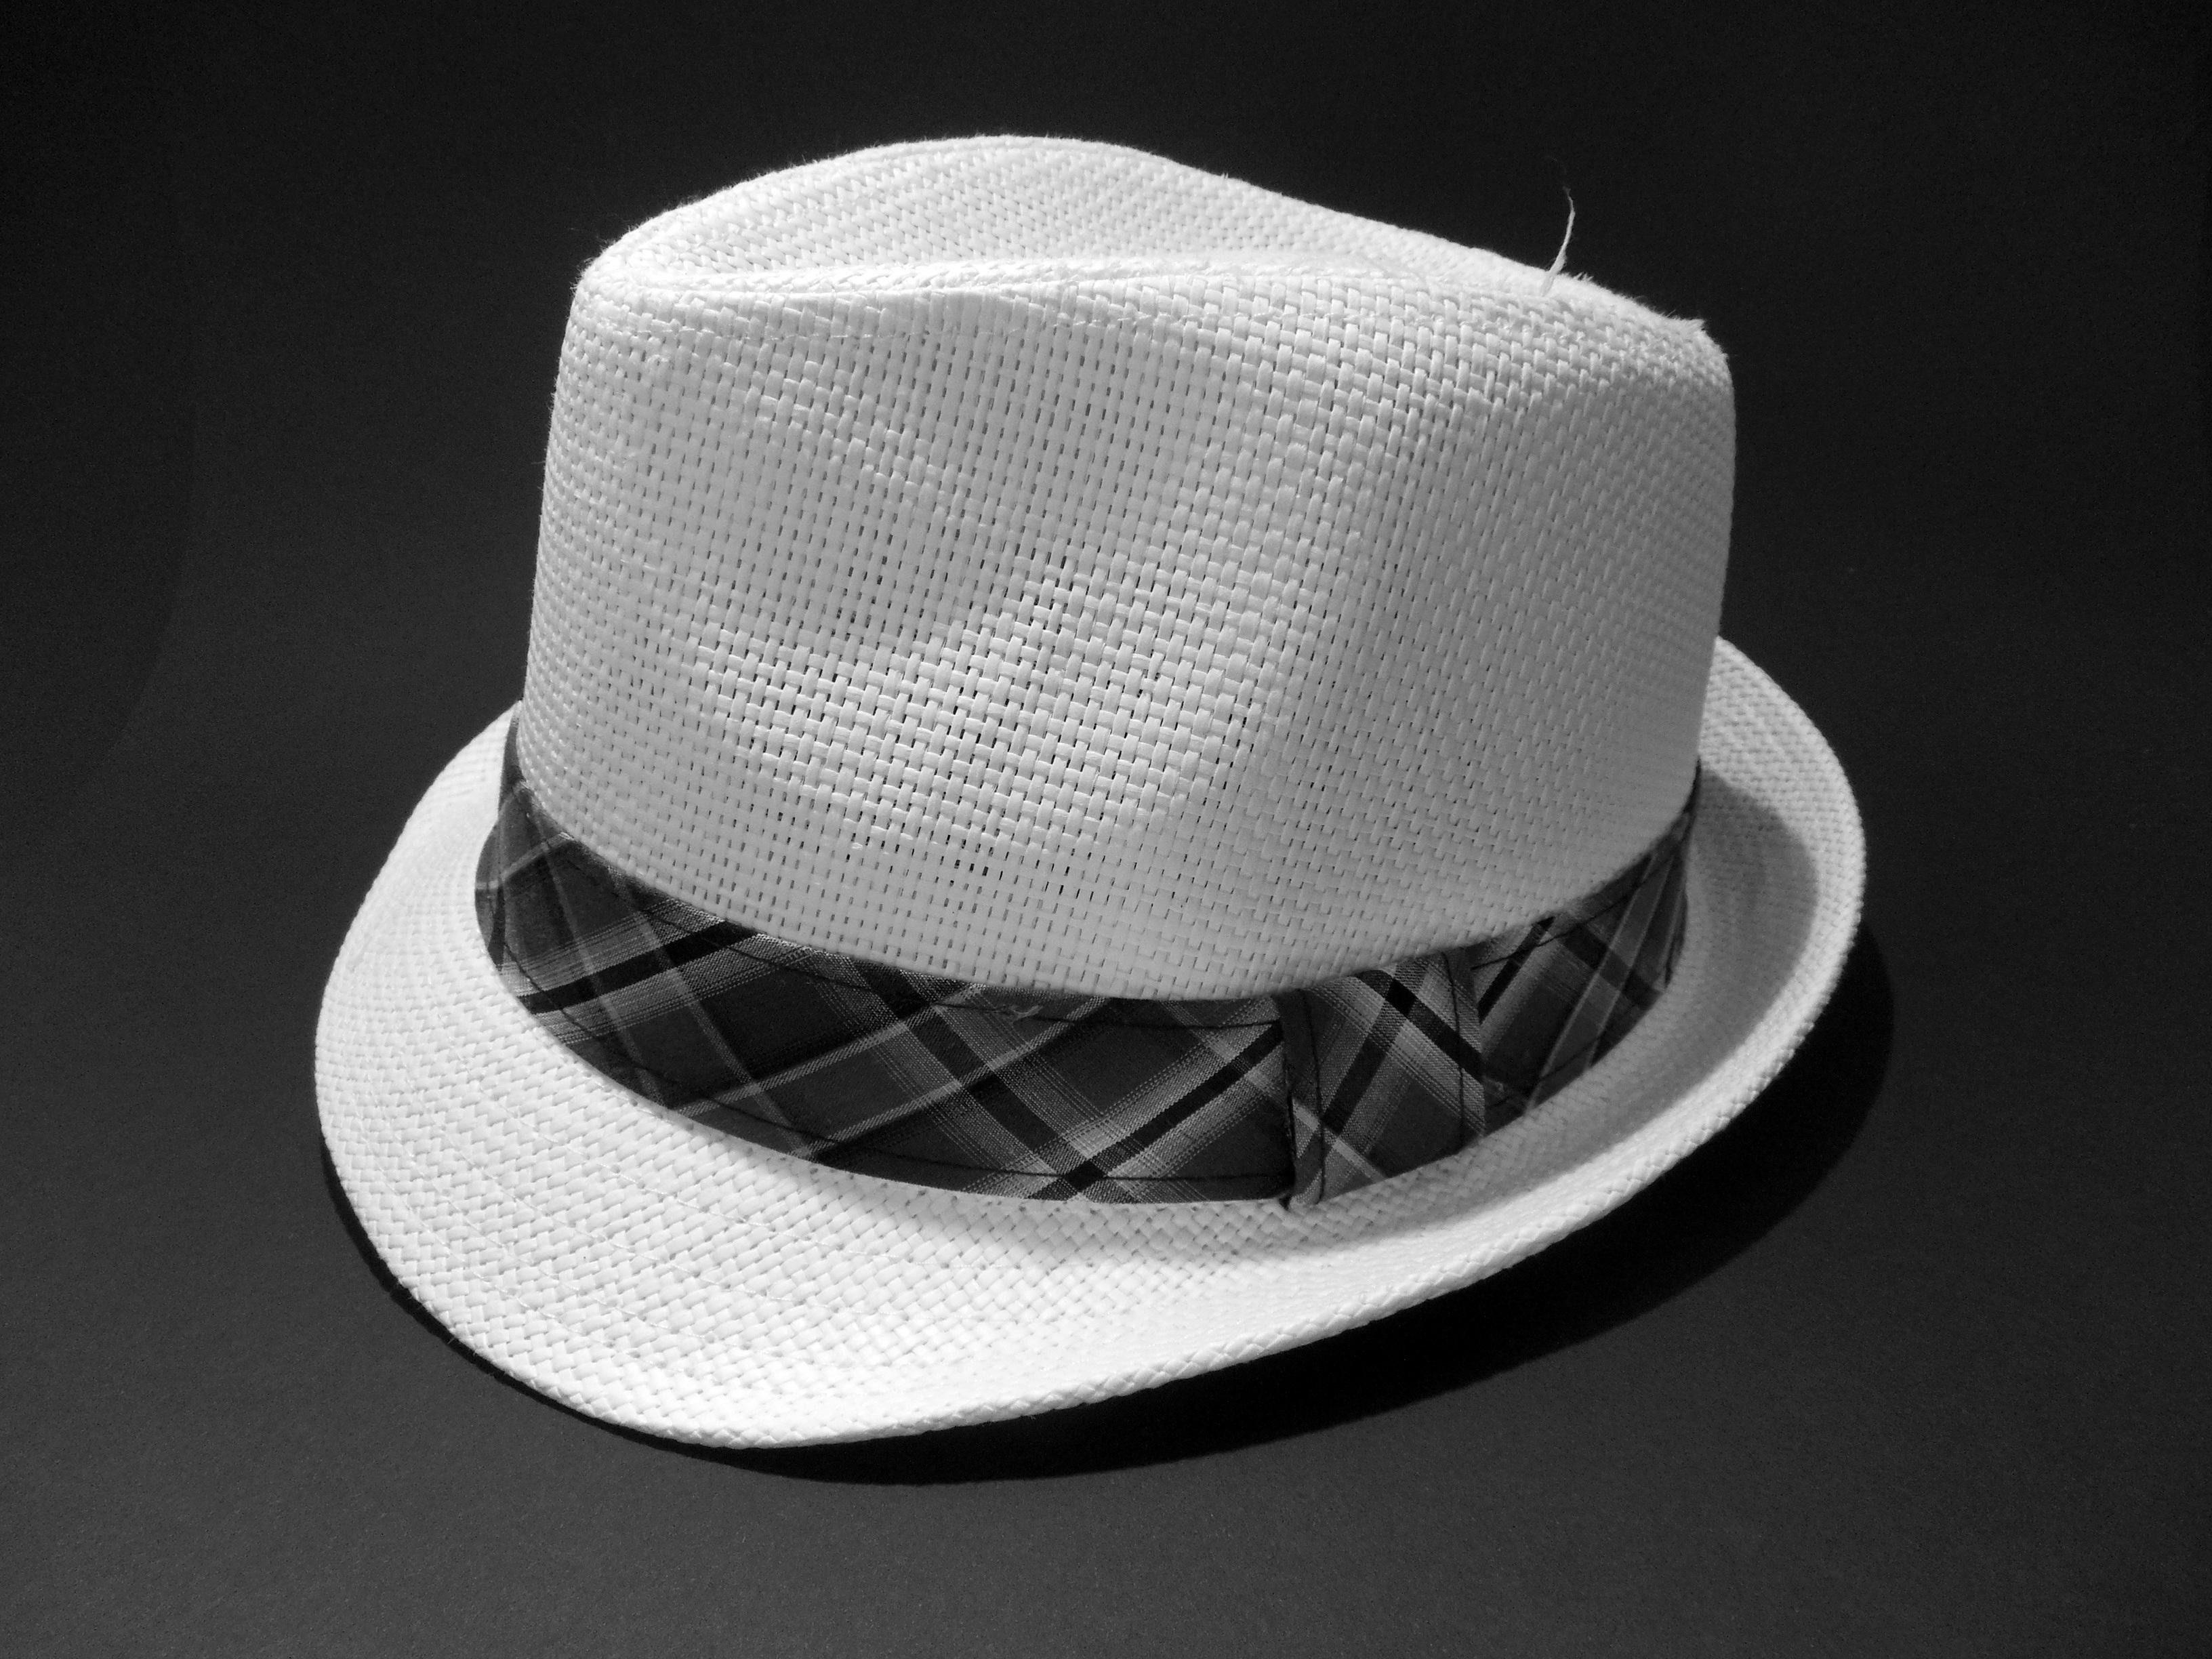 blanco Retro sombrero ropa Casco sombrero de copa sombrero para el sol  gorra Sombrerería Fedora sombrero bbb06d48e80